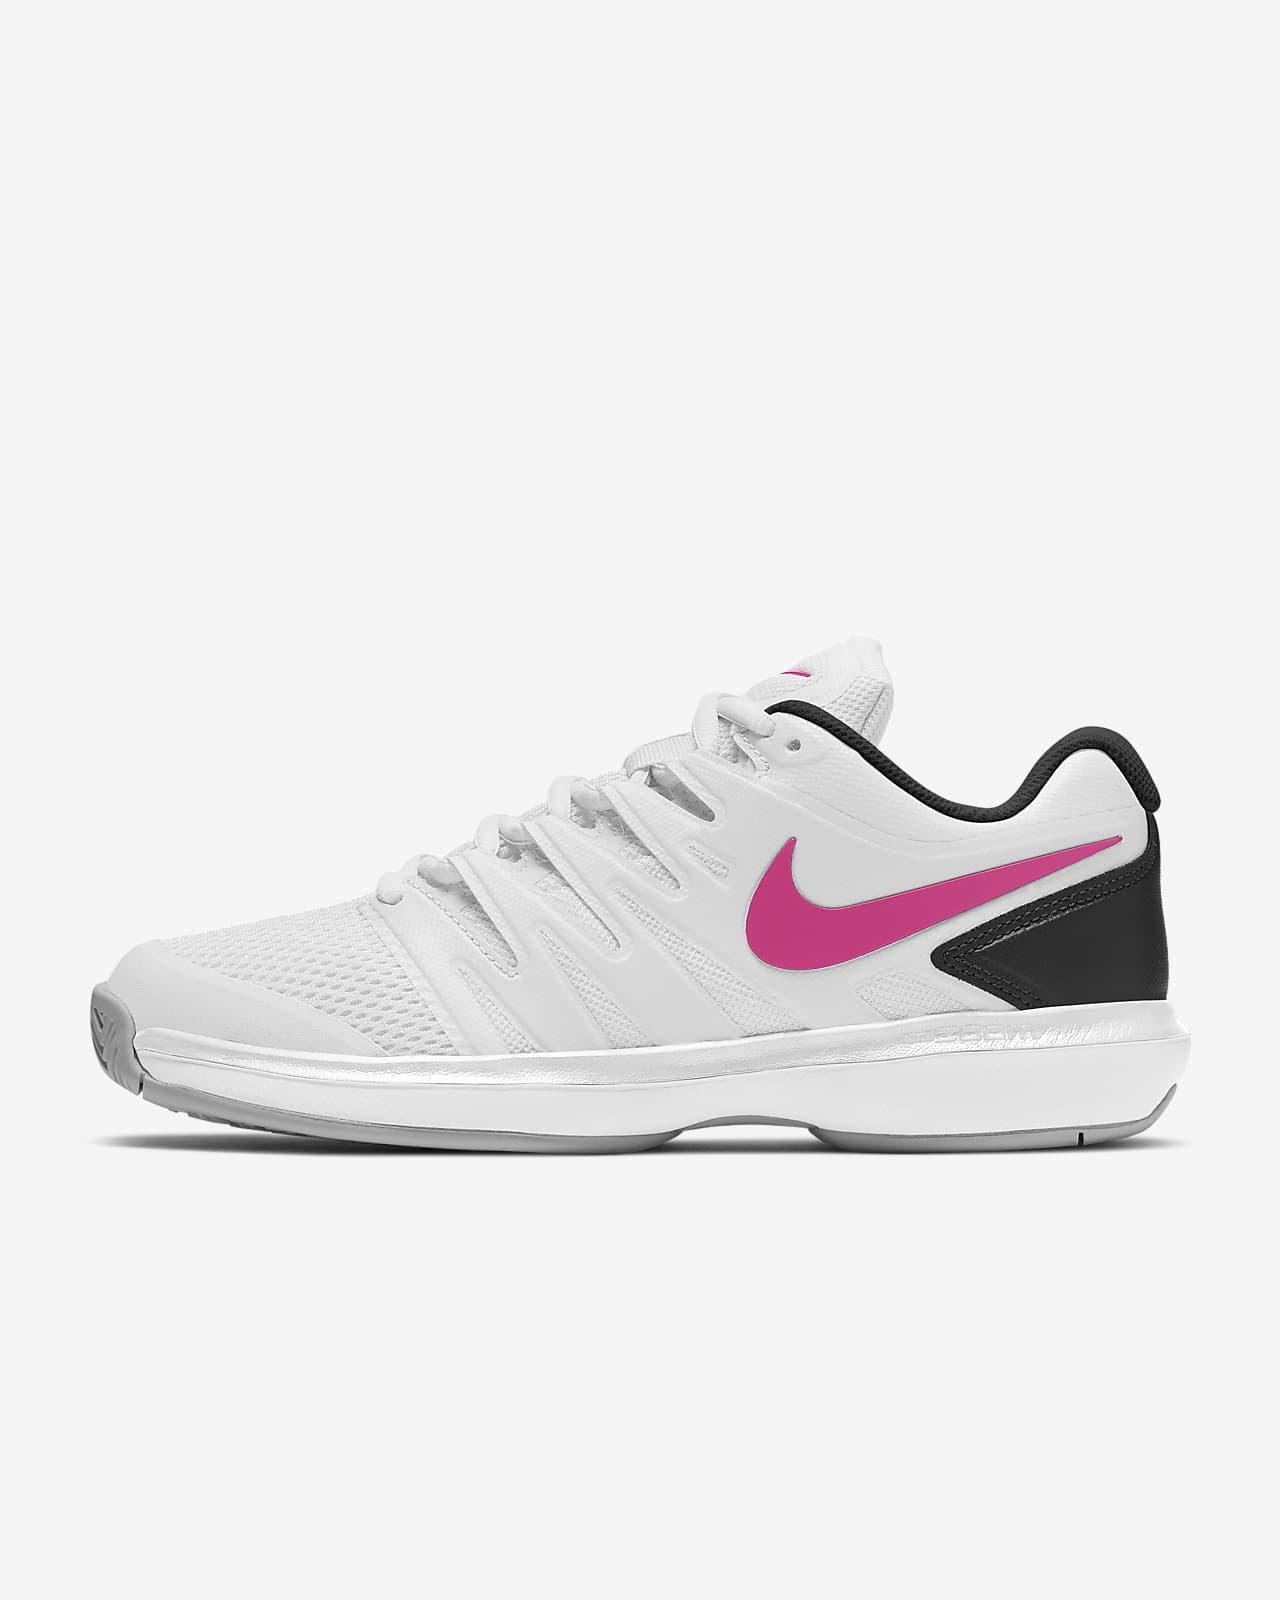 NikeCourt Air Zoom Prestige Women's